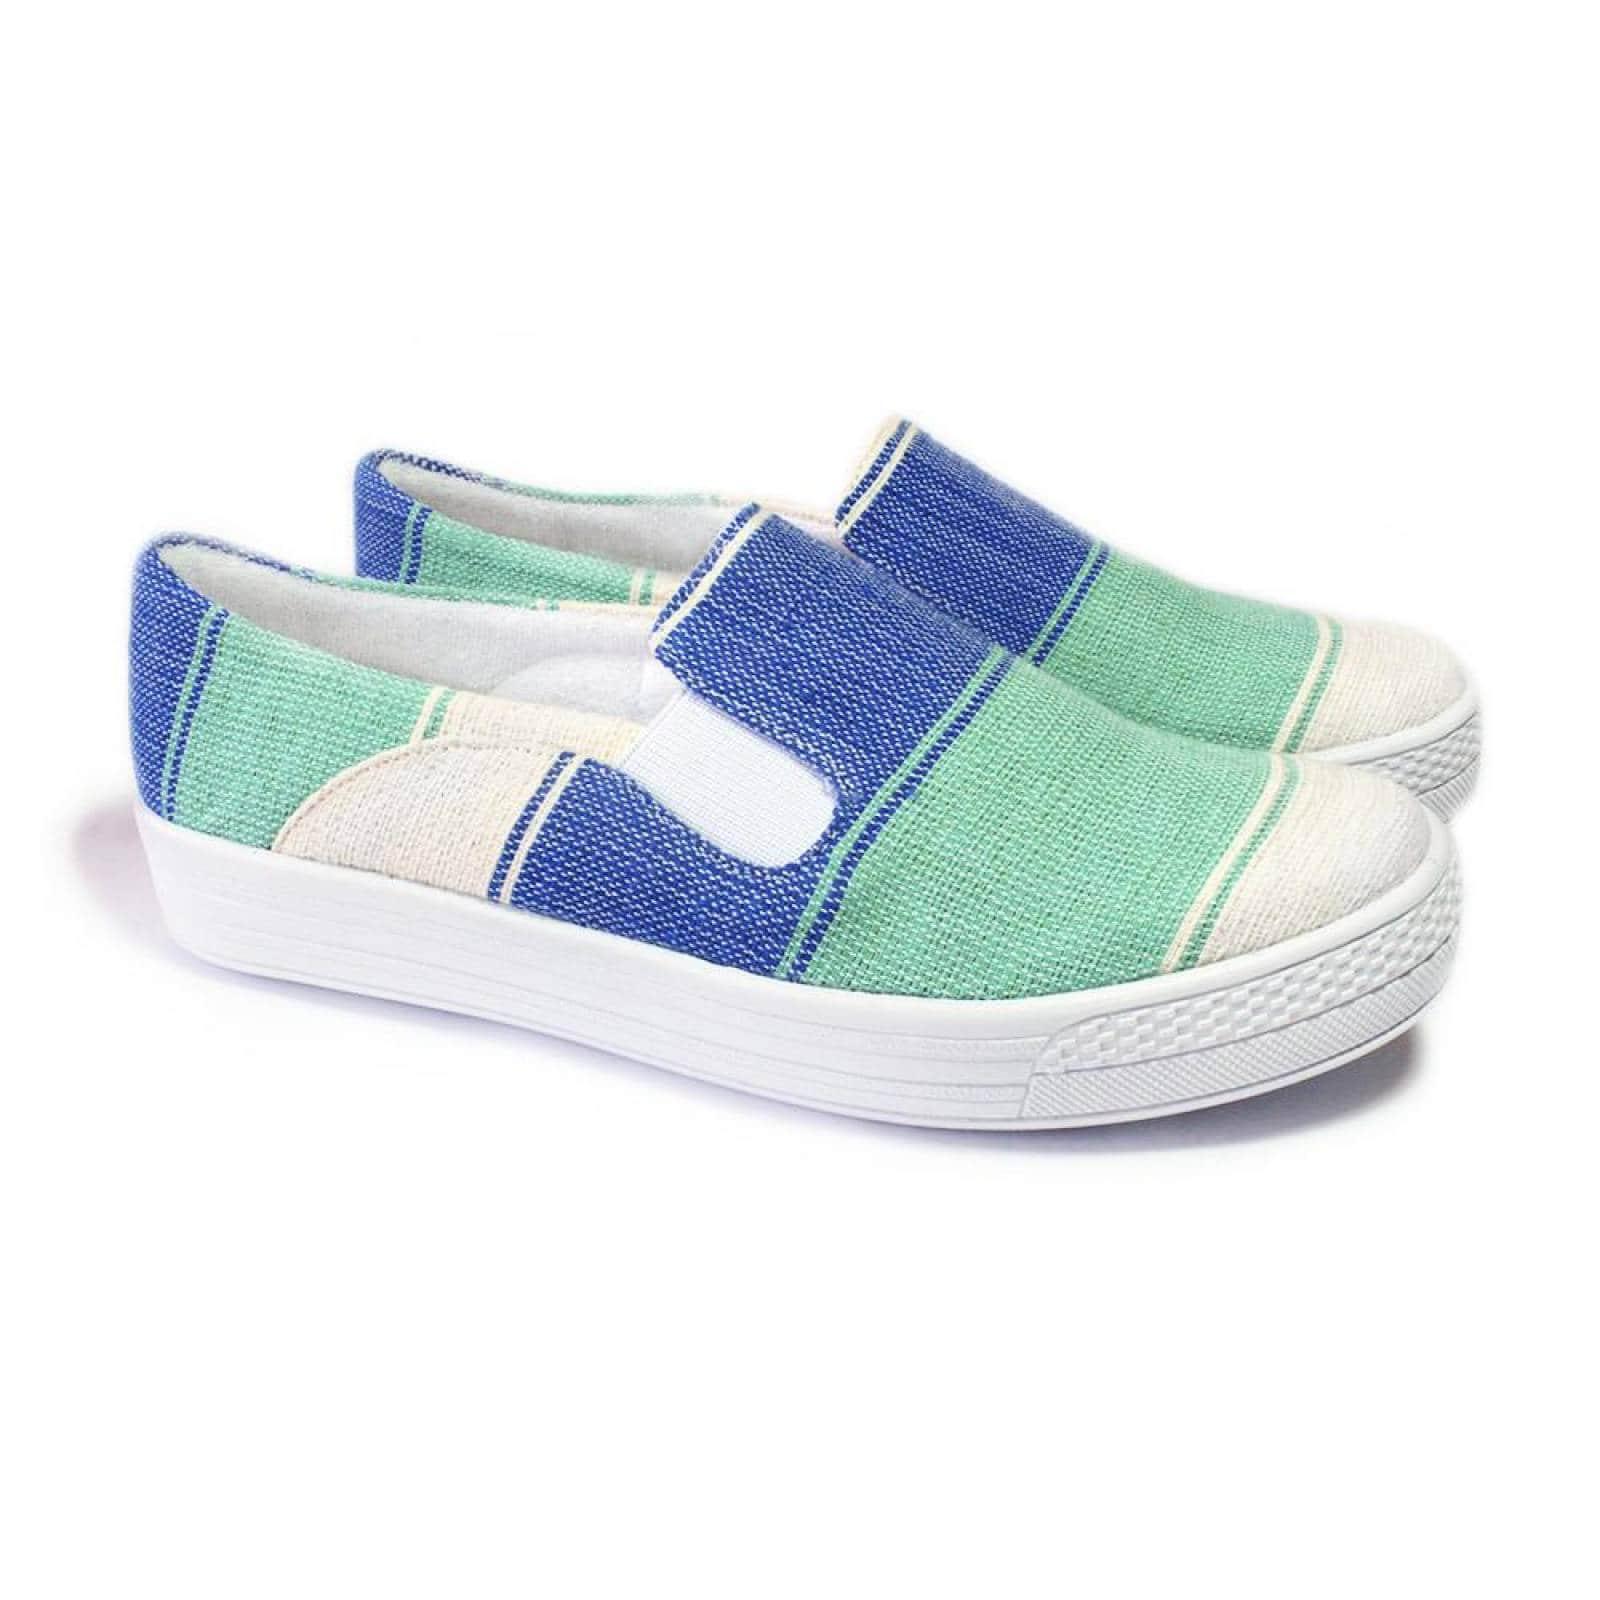 Tenis Zapato Slip On Artesanal Tela Mujer Lola Azul Komoni Talla: 24